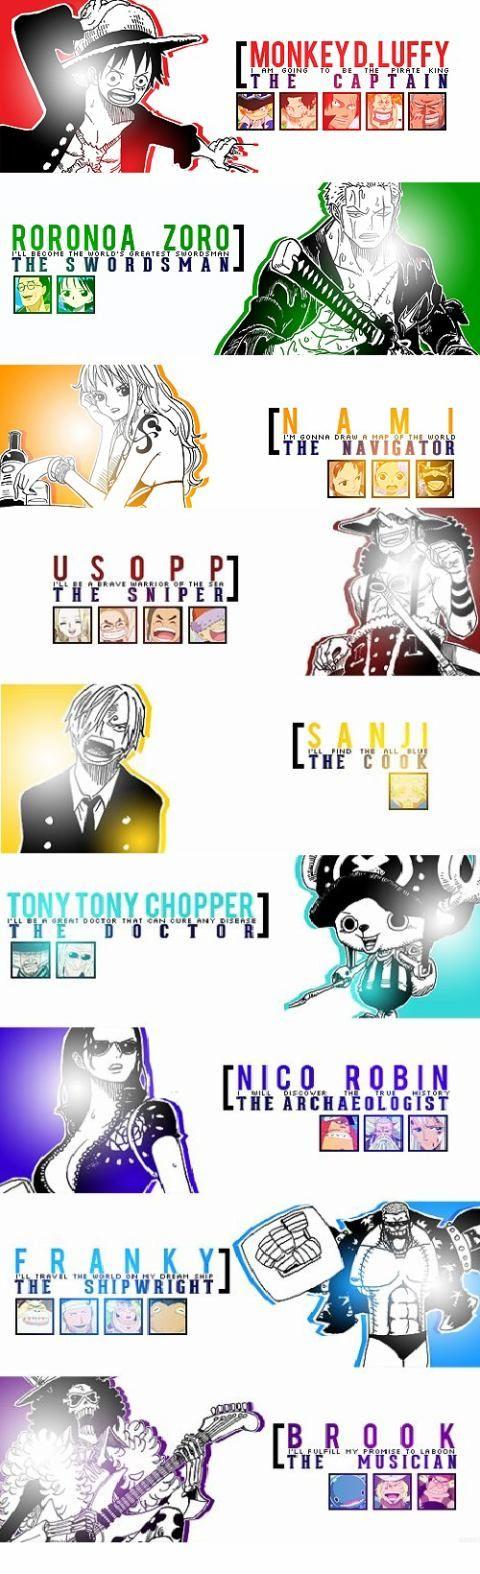 Their roles/Luffy,Zoro,Nami, Usopp,Sanji,Chopper,Robin, Franky,Brook/One piece